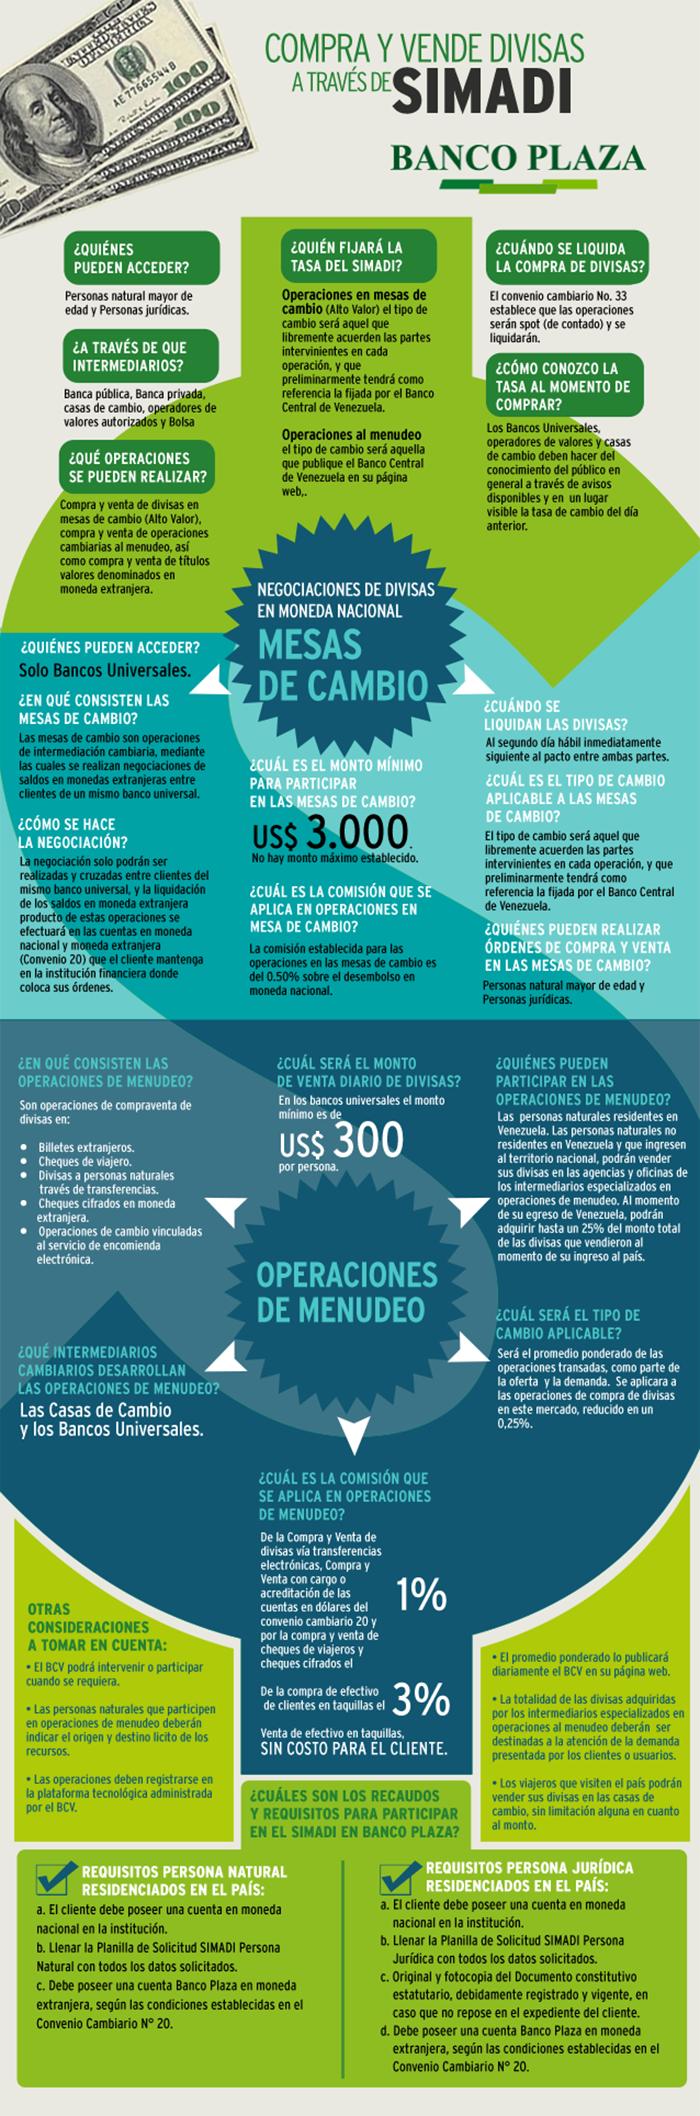 InfografiaSIMADI